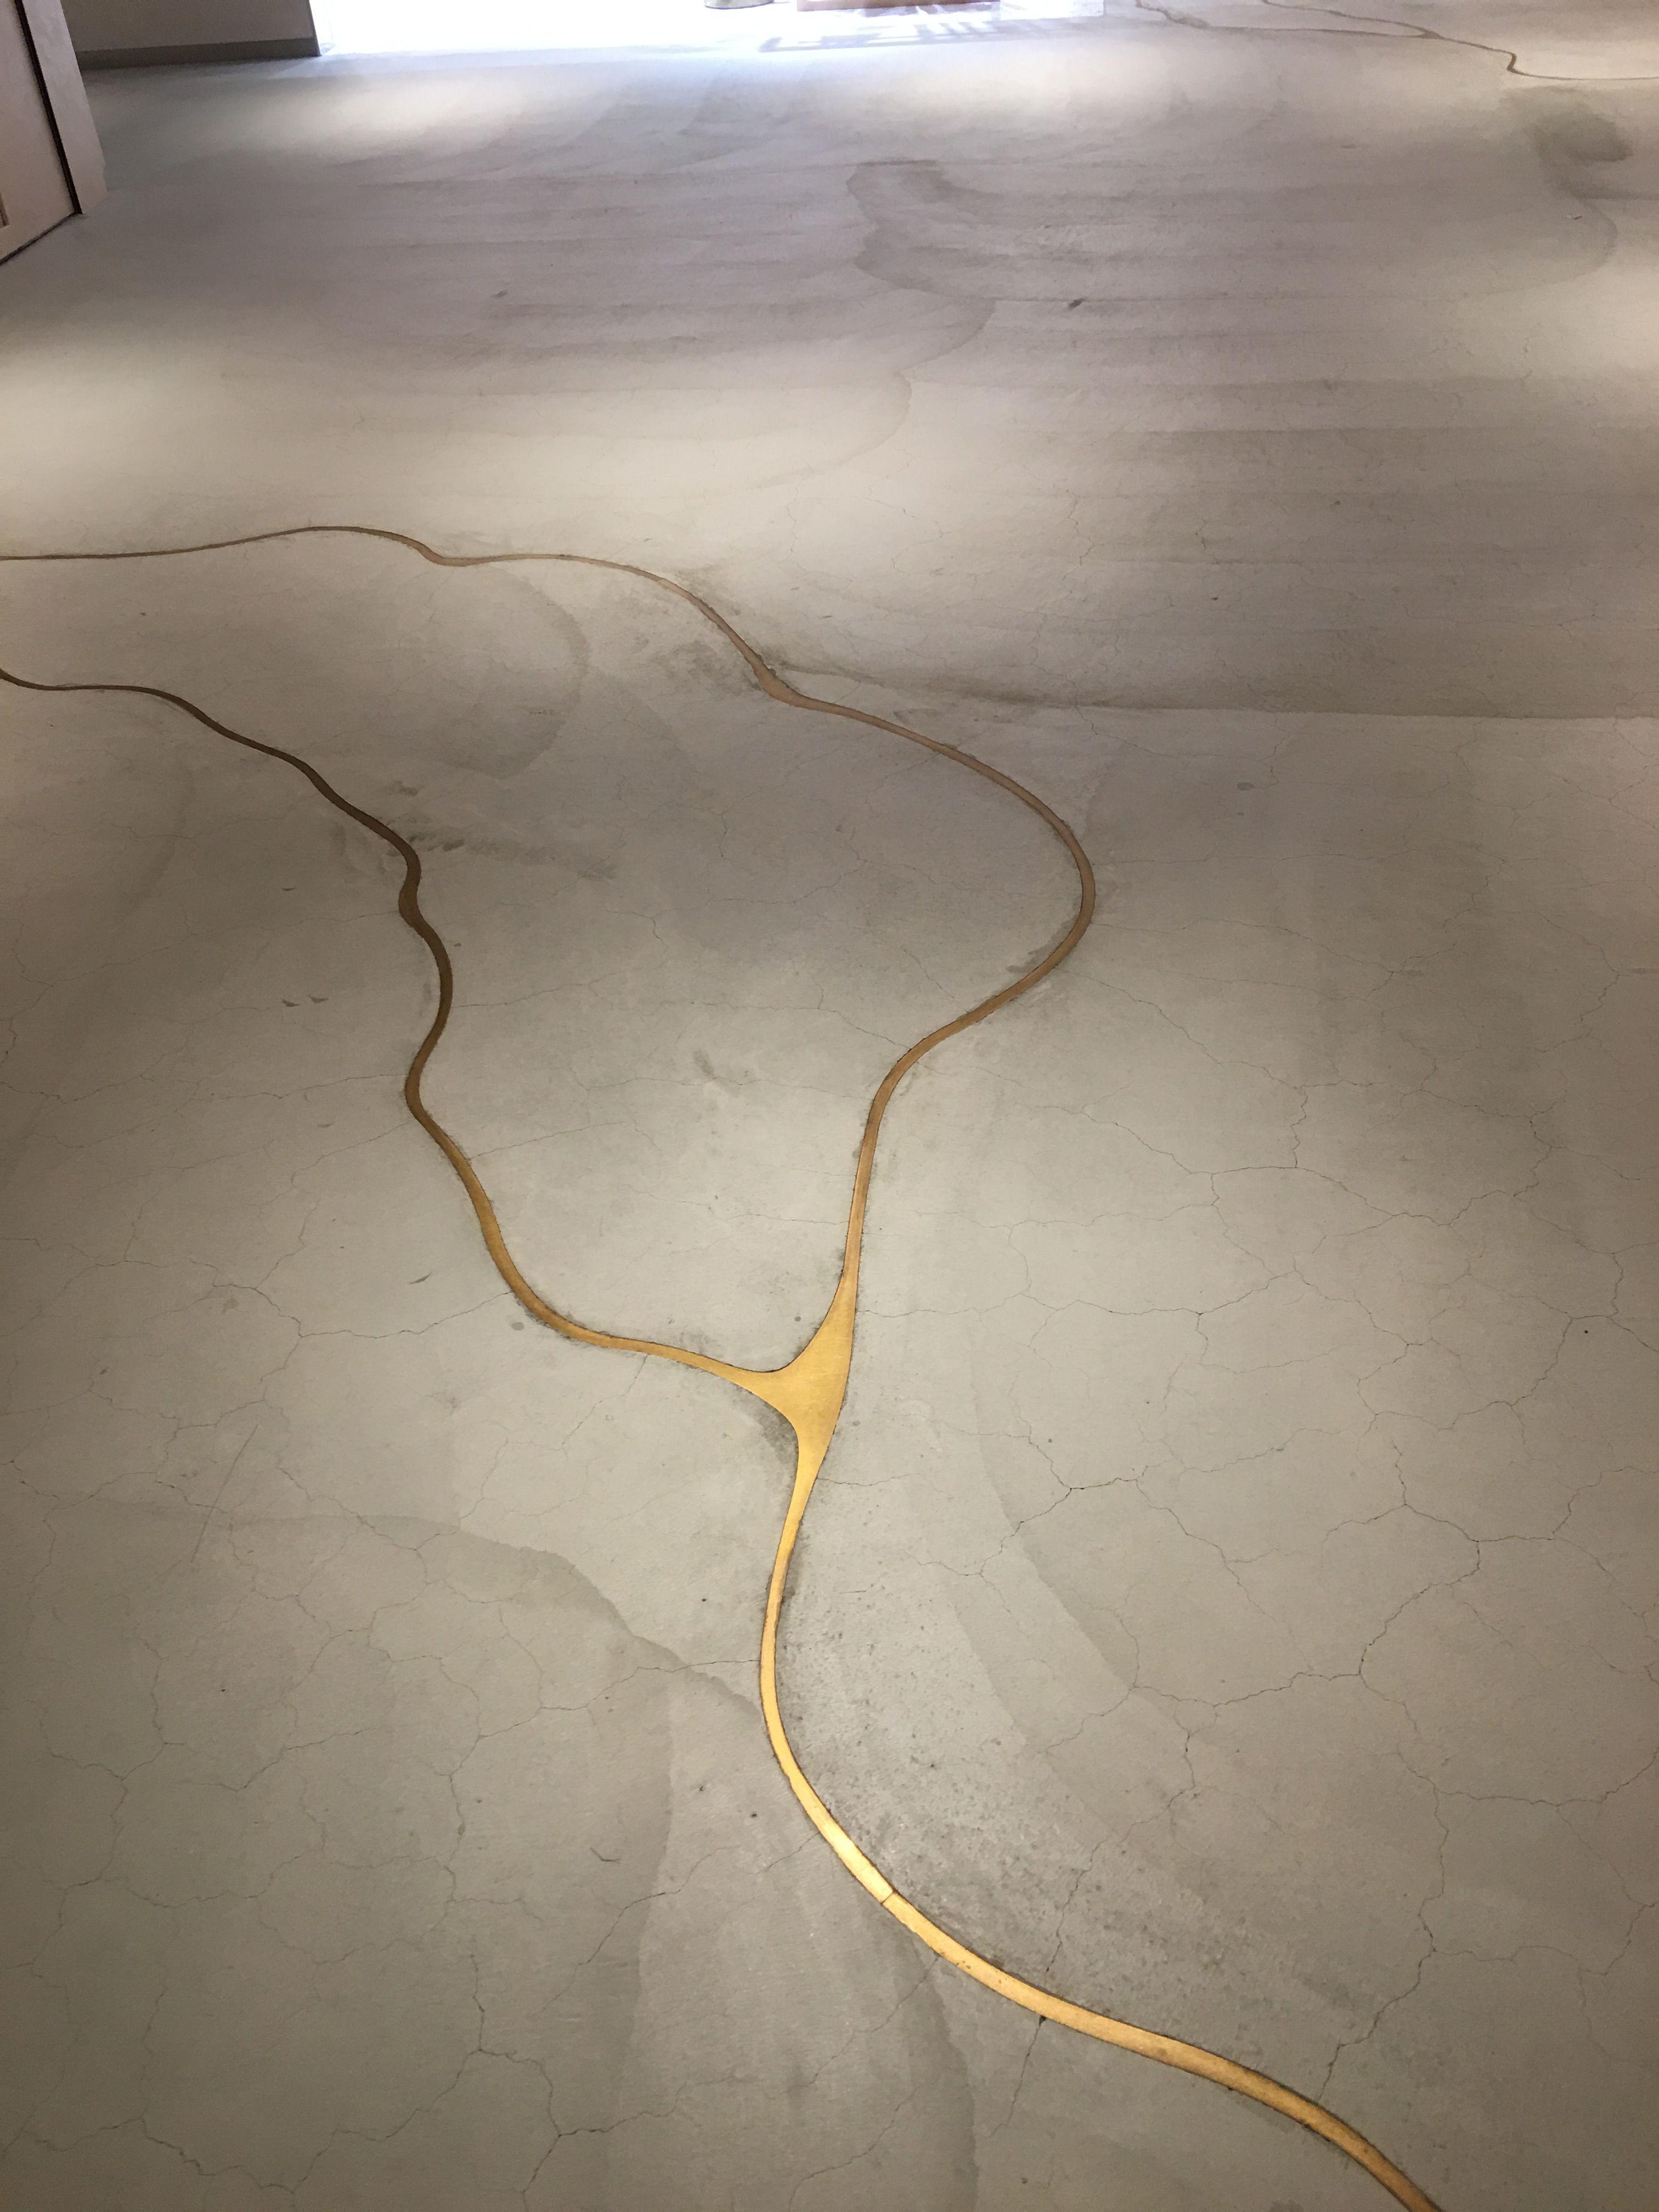 If Our Concrete Floor Cracks, Weu0027re Doing This To It! Itu0027s Concrete